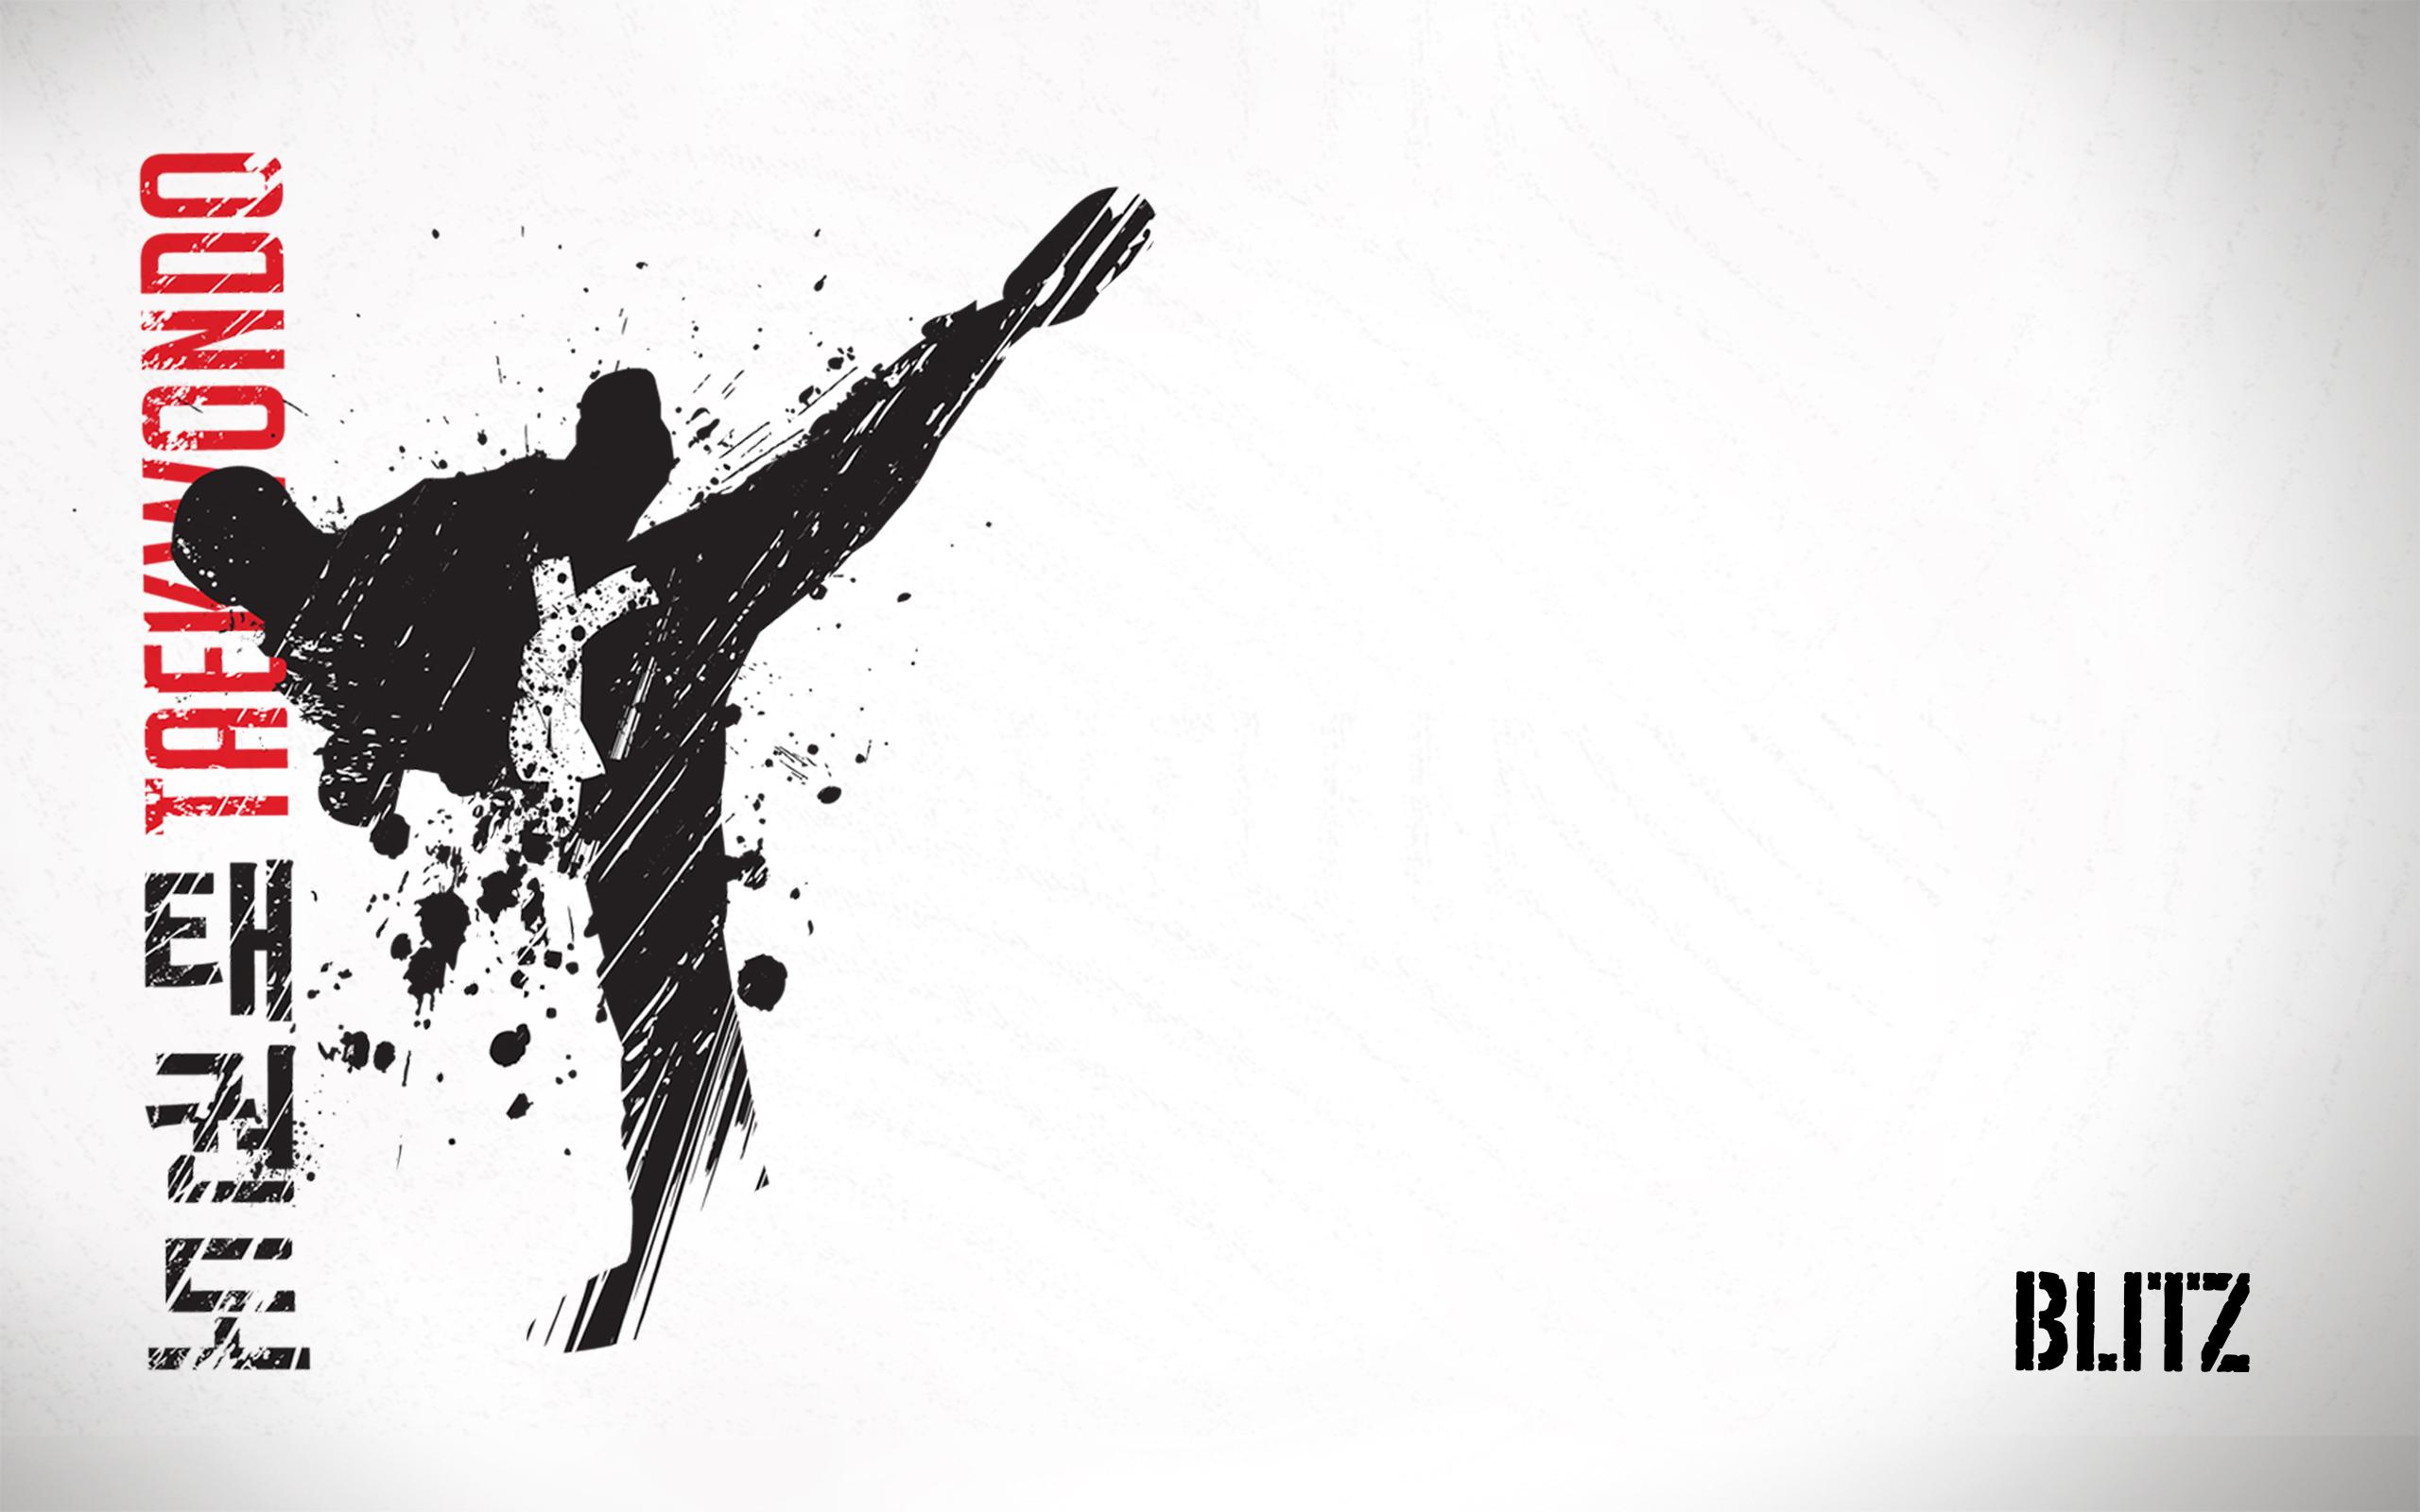 Blitz Sport Taekwondo Wallpaper 2560x1600jpg 2560x1600